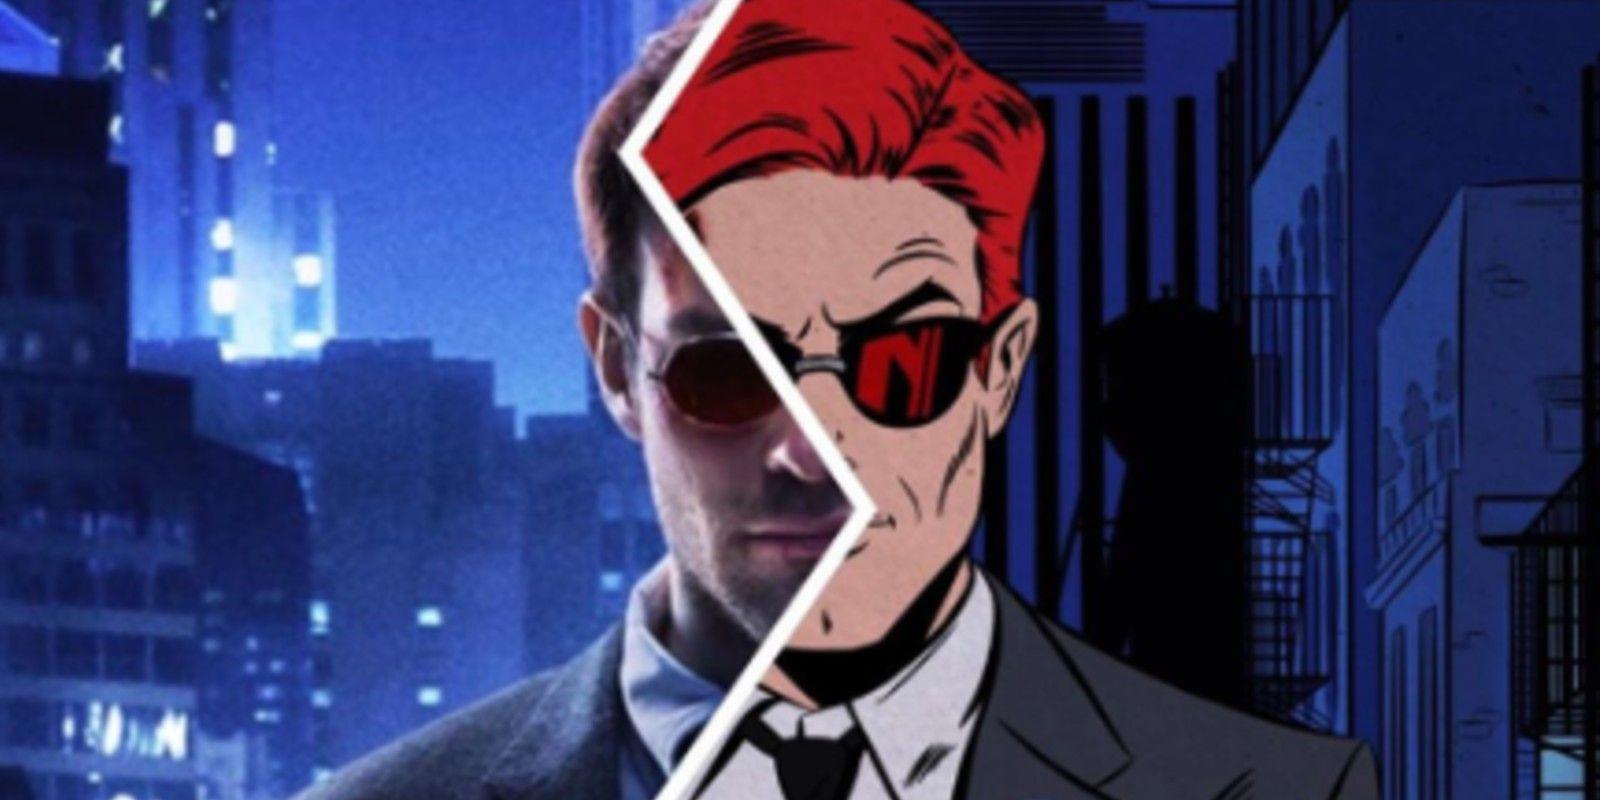 Netflix's Daredevil Poster As Marvel Comic Book Art Is Stunning